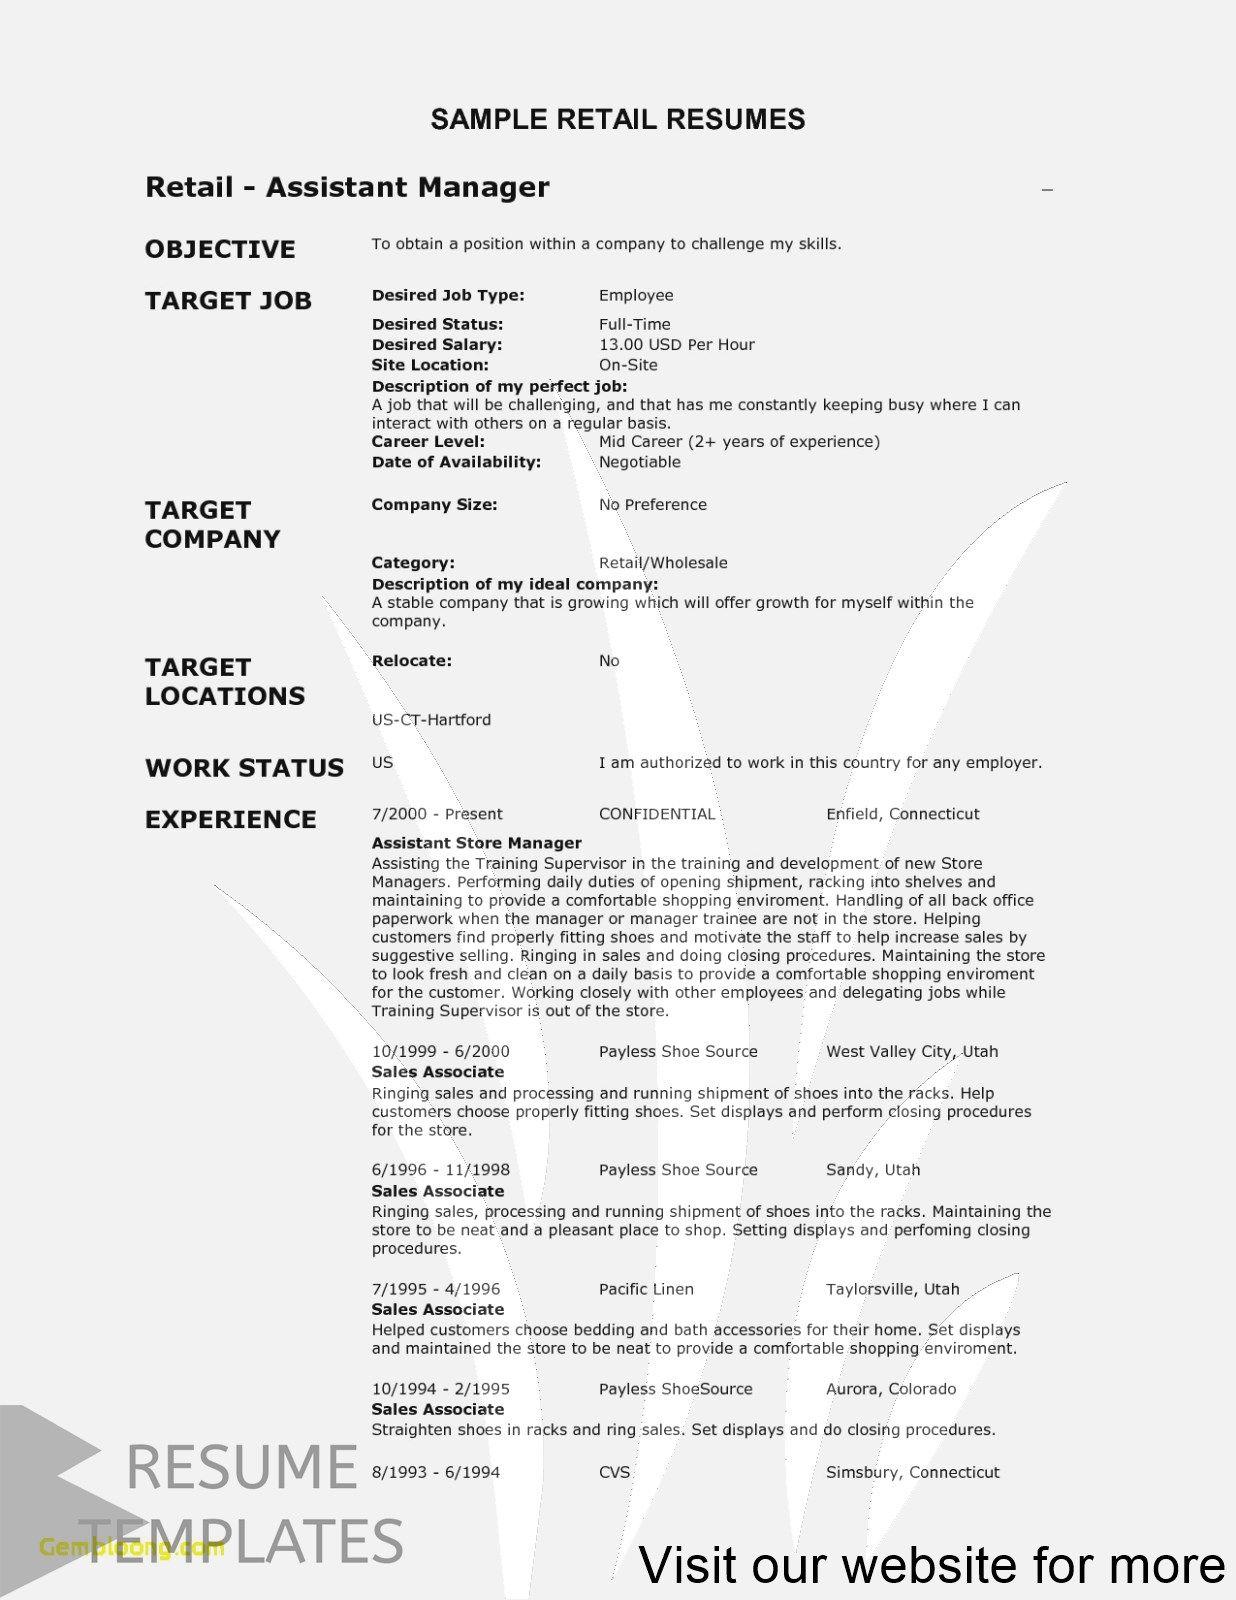 CV Resume www.ikono.me Cv resume template, Free